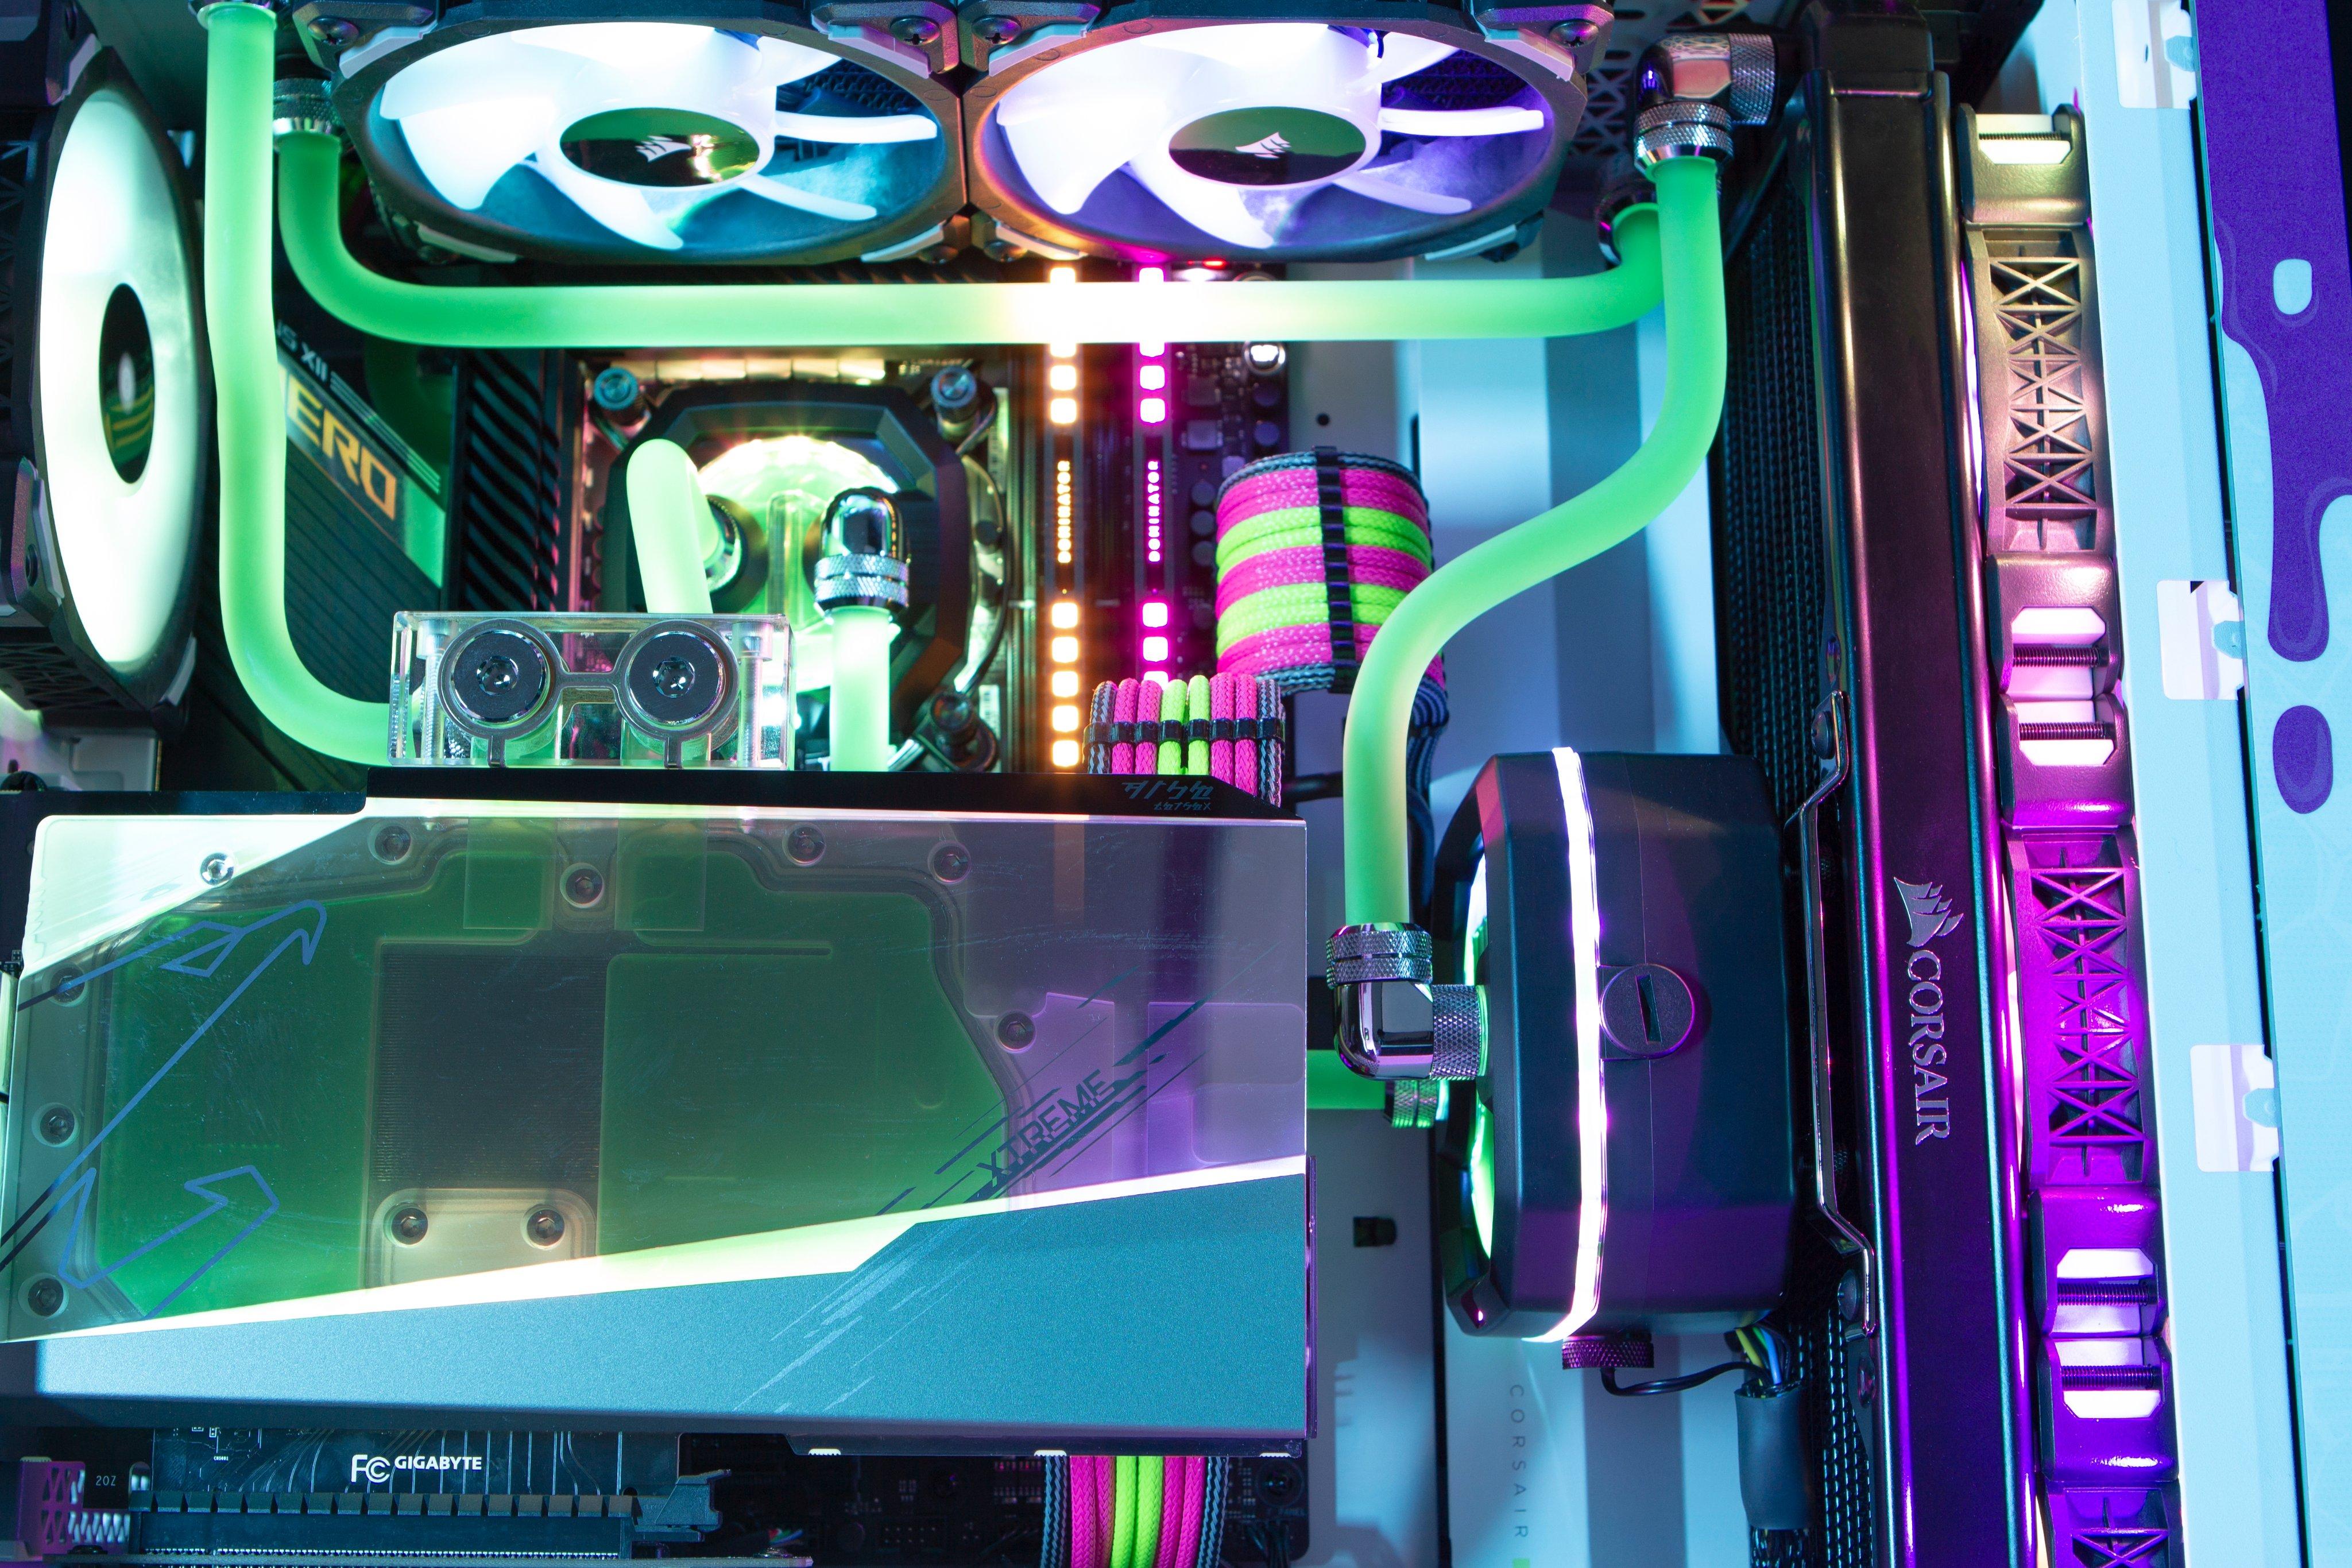 Reign x Sneak Custom PC Insides